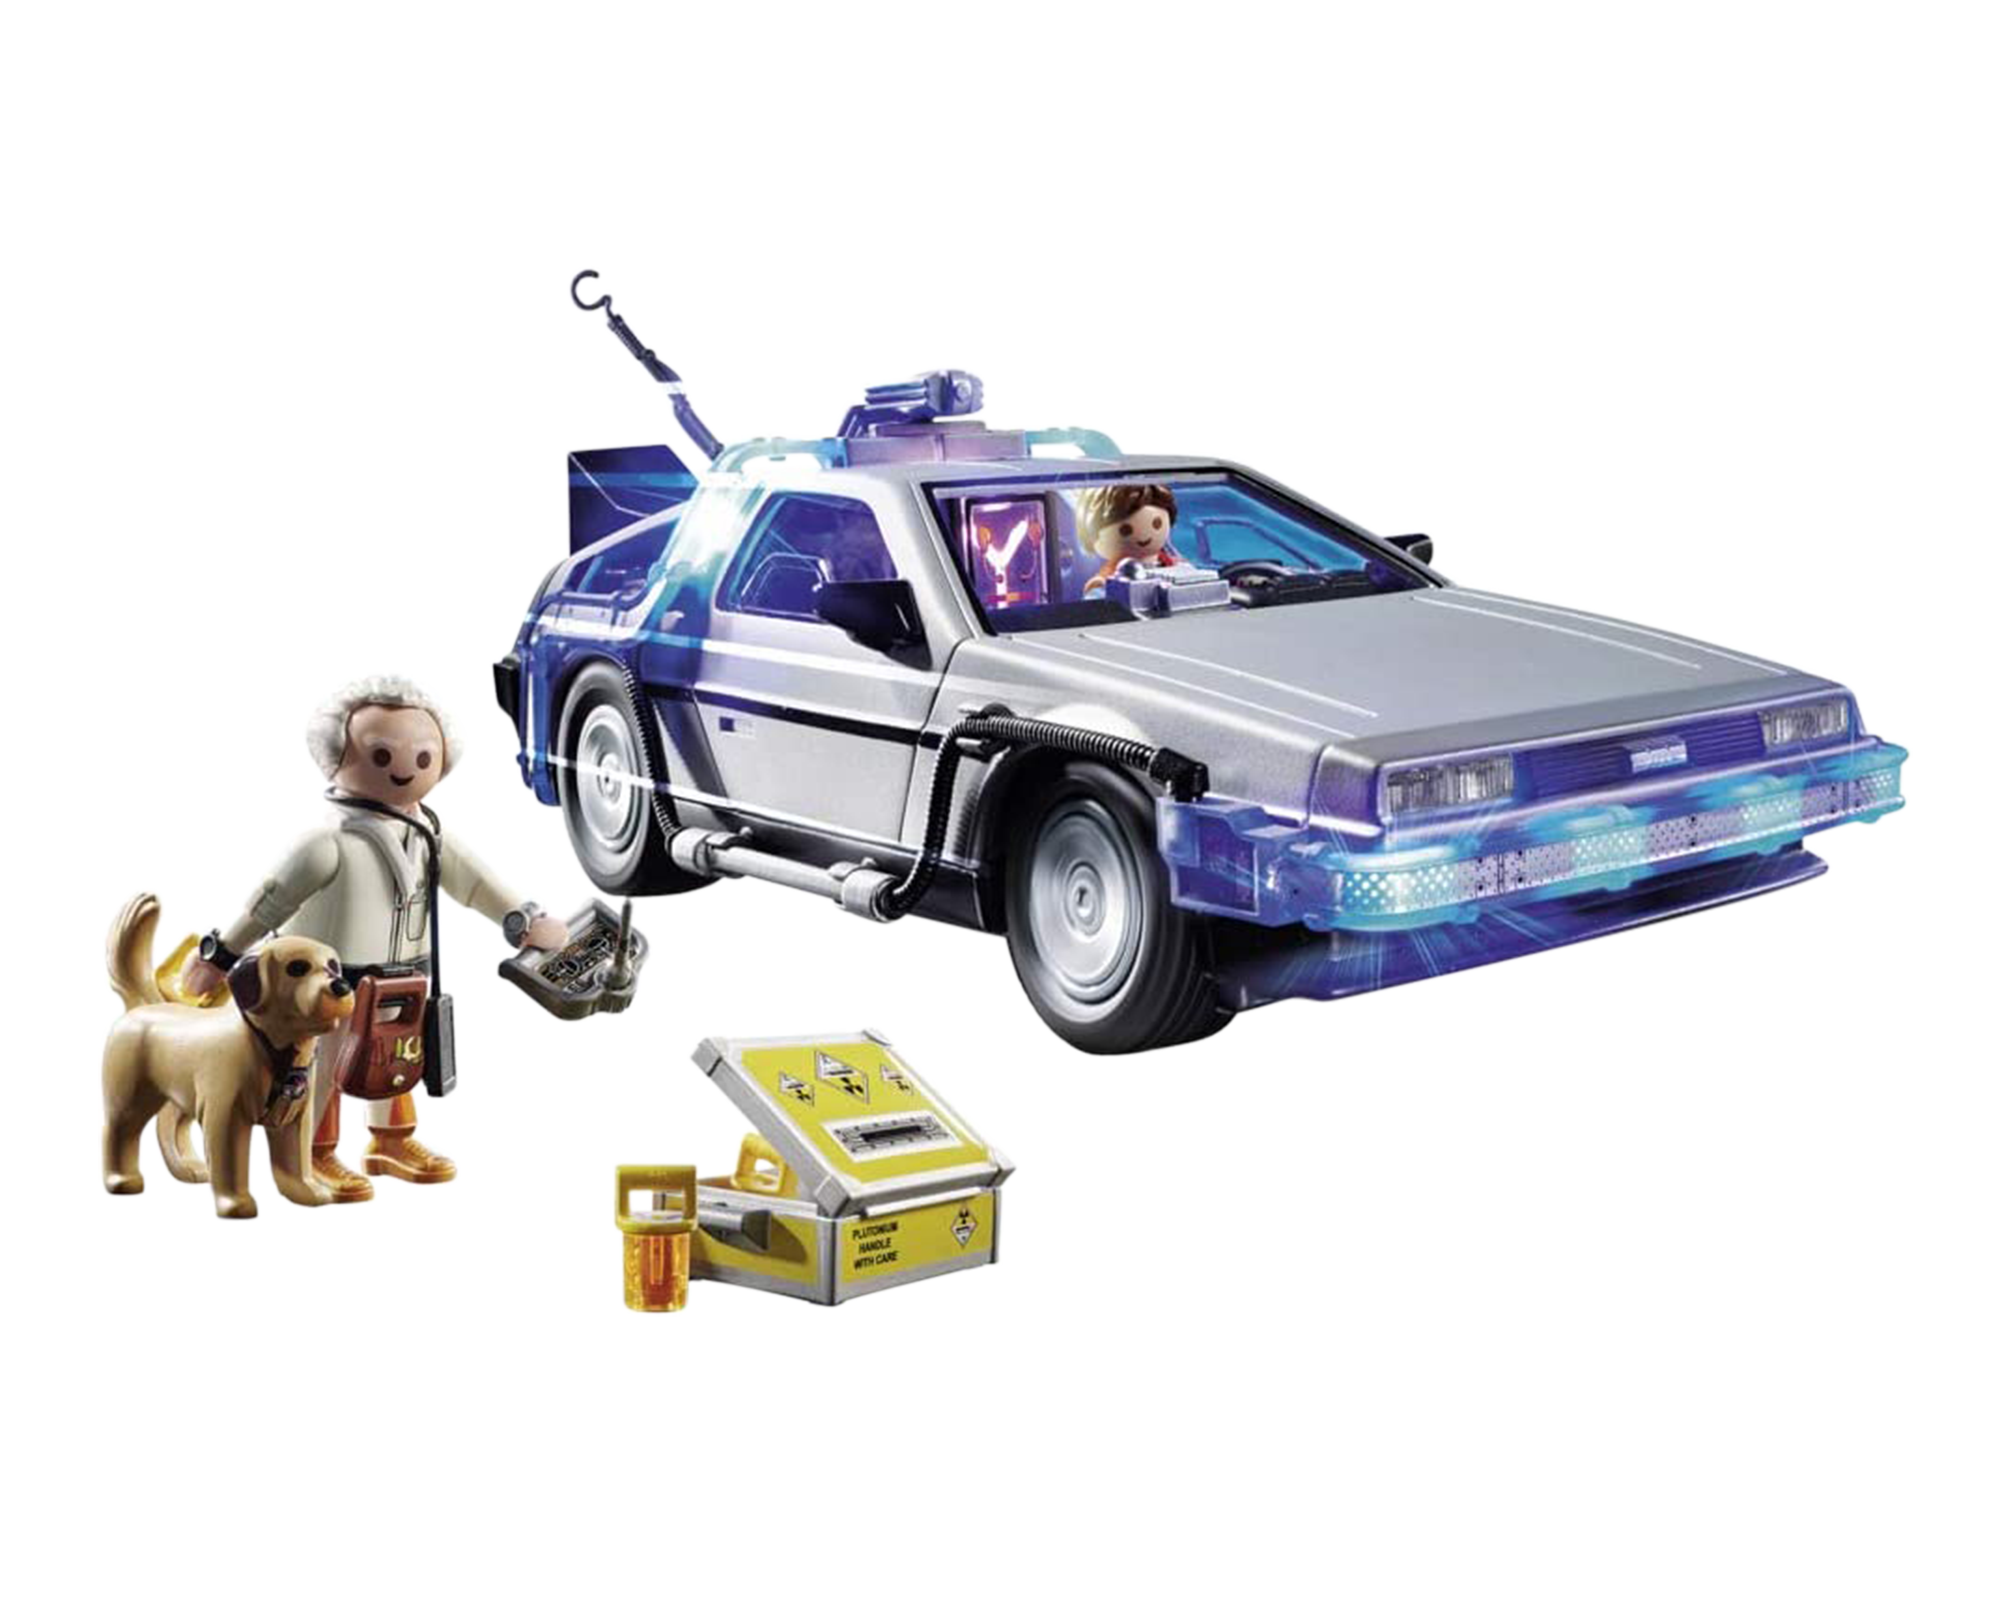 Amazon.co.uk Announces Top 12 Kids Toys for Christmas 2020